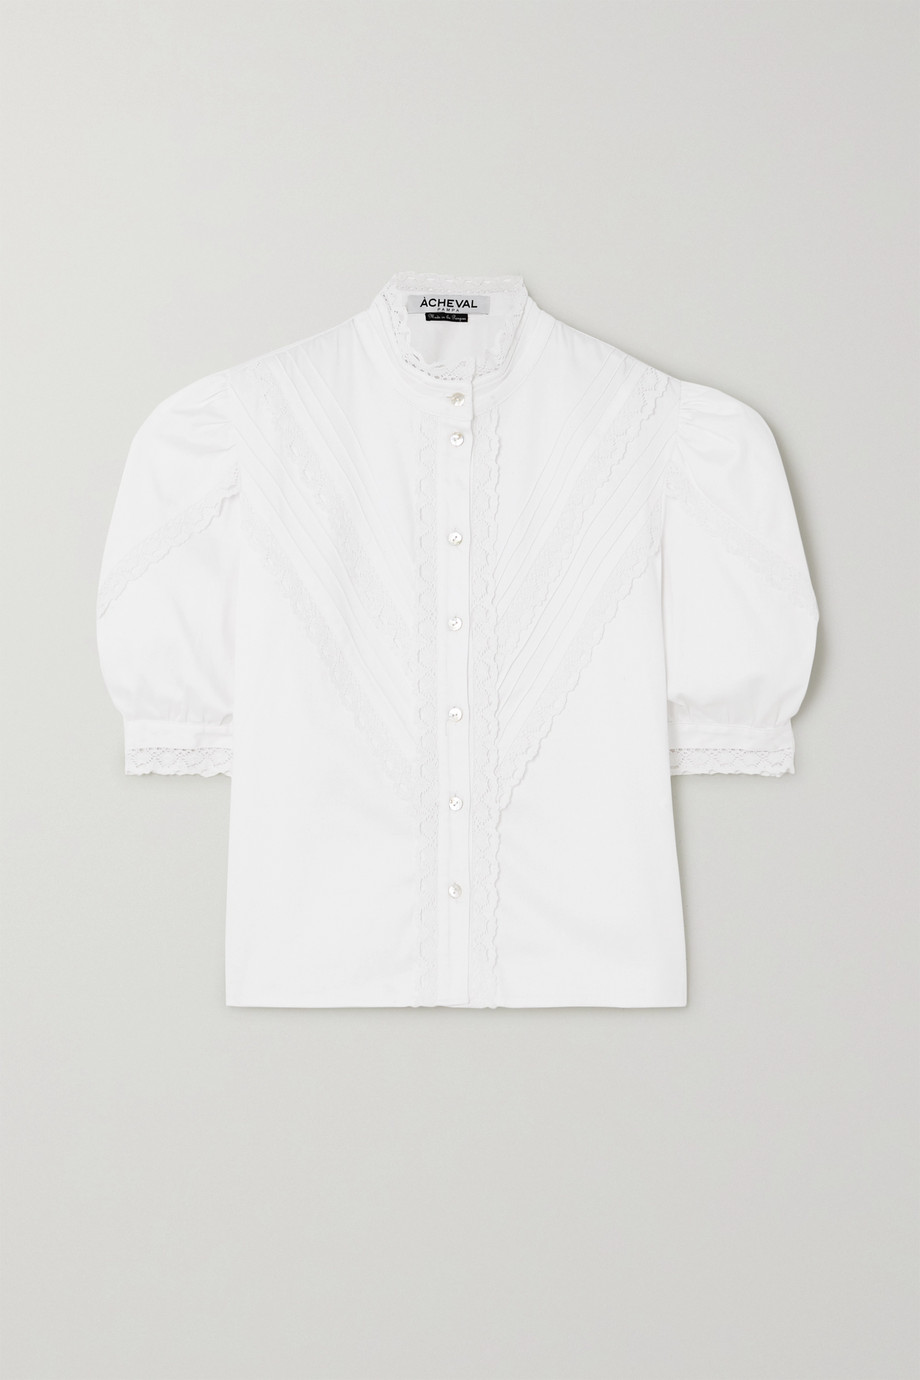 Àcheval Pampa Yegua lace-trimmed cotton-blend blouse